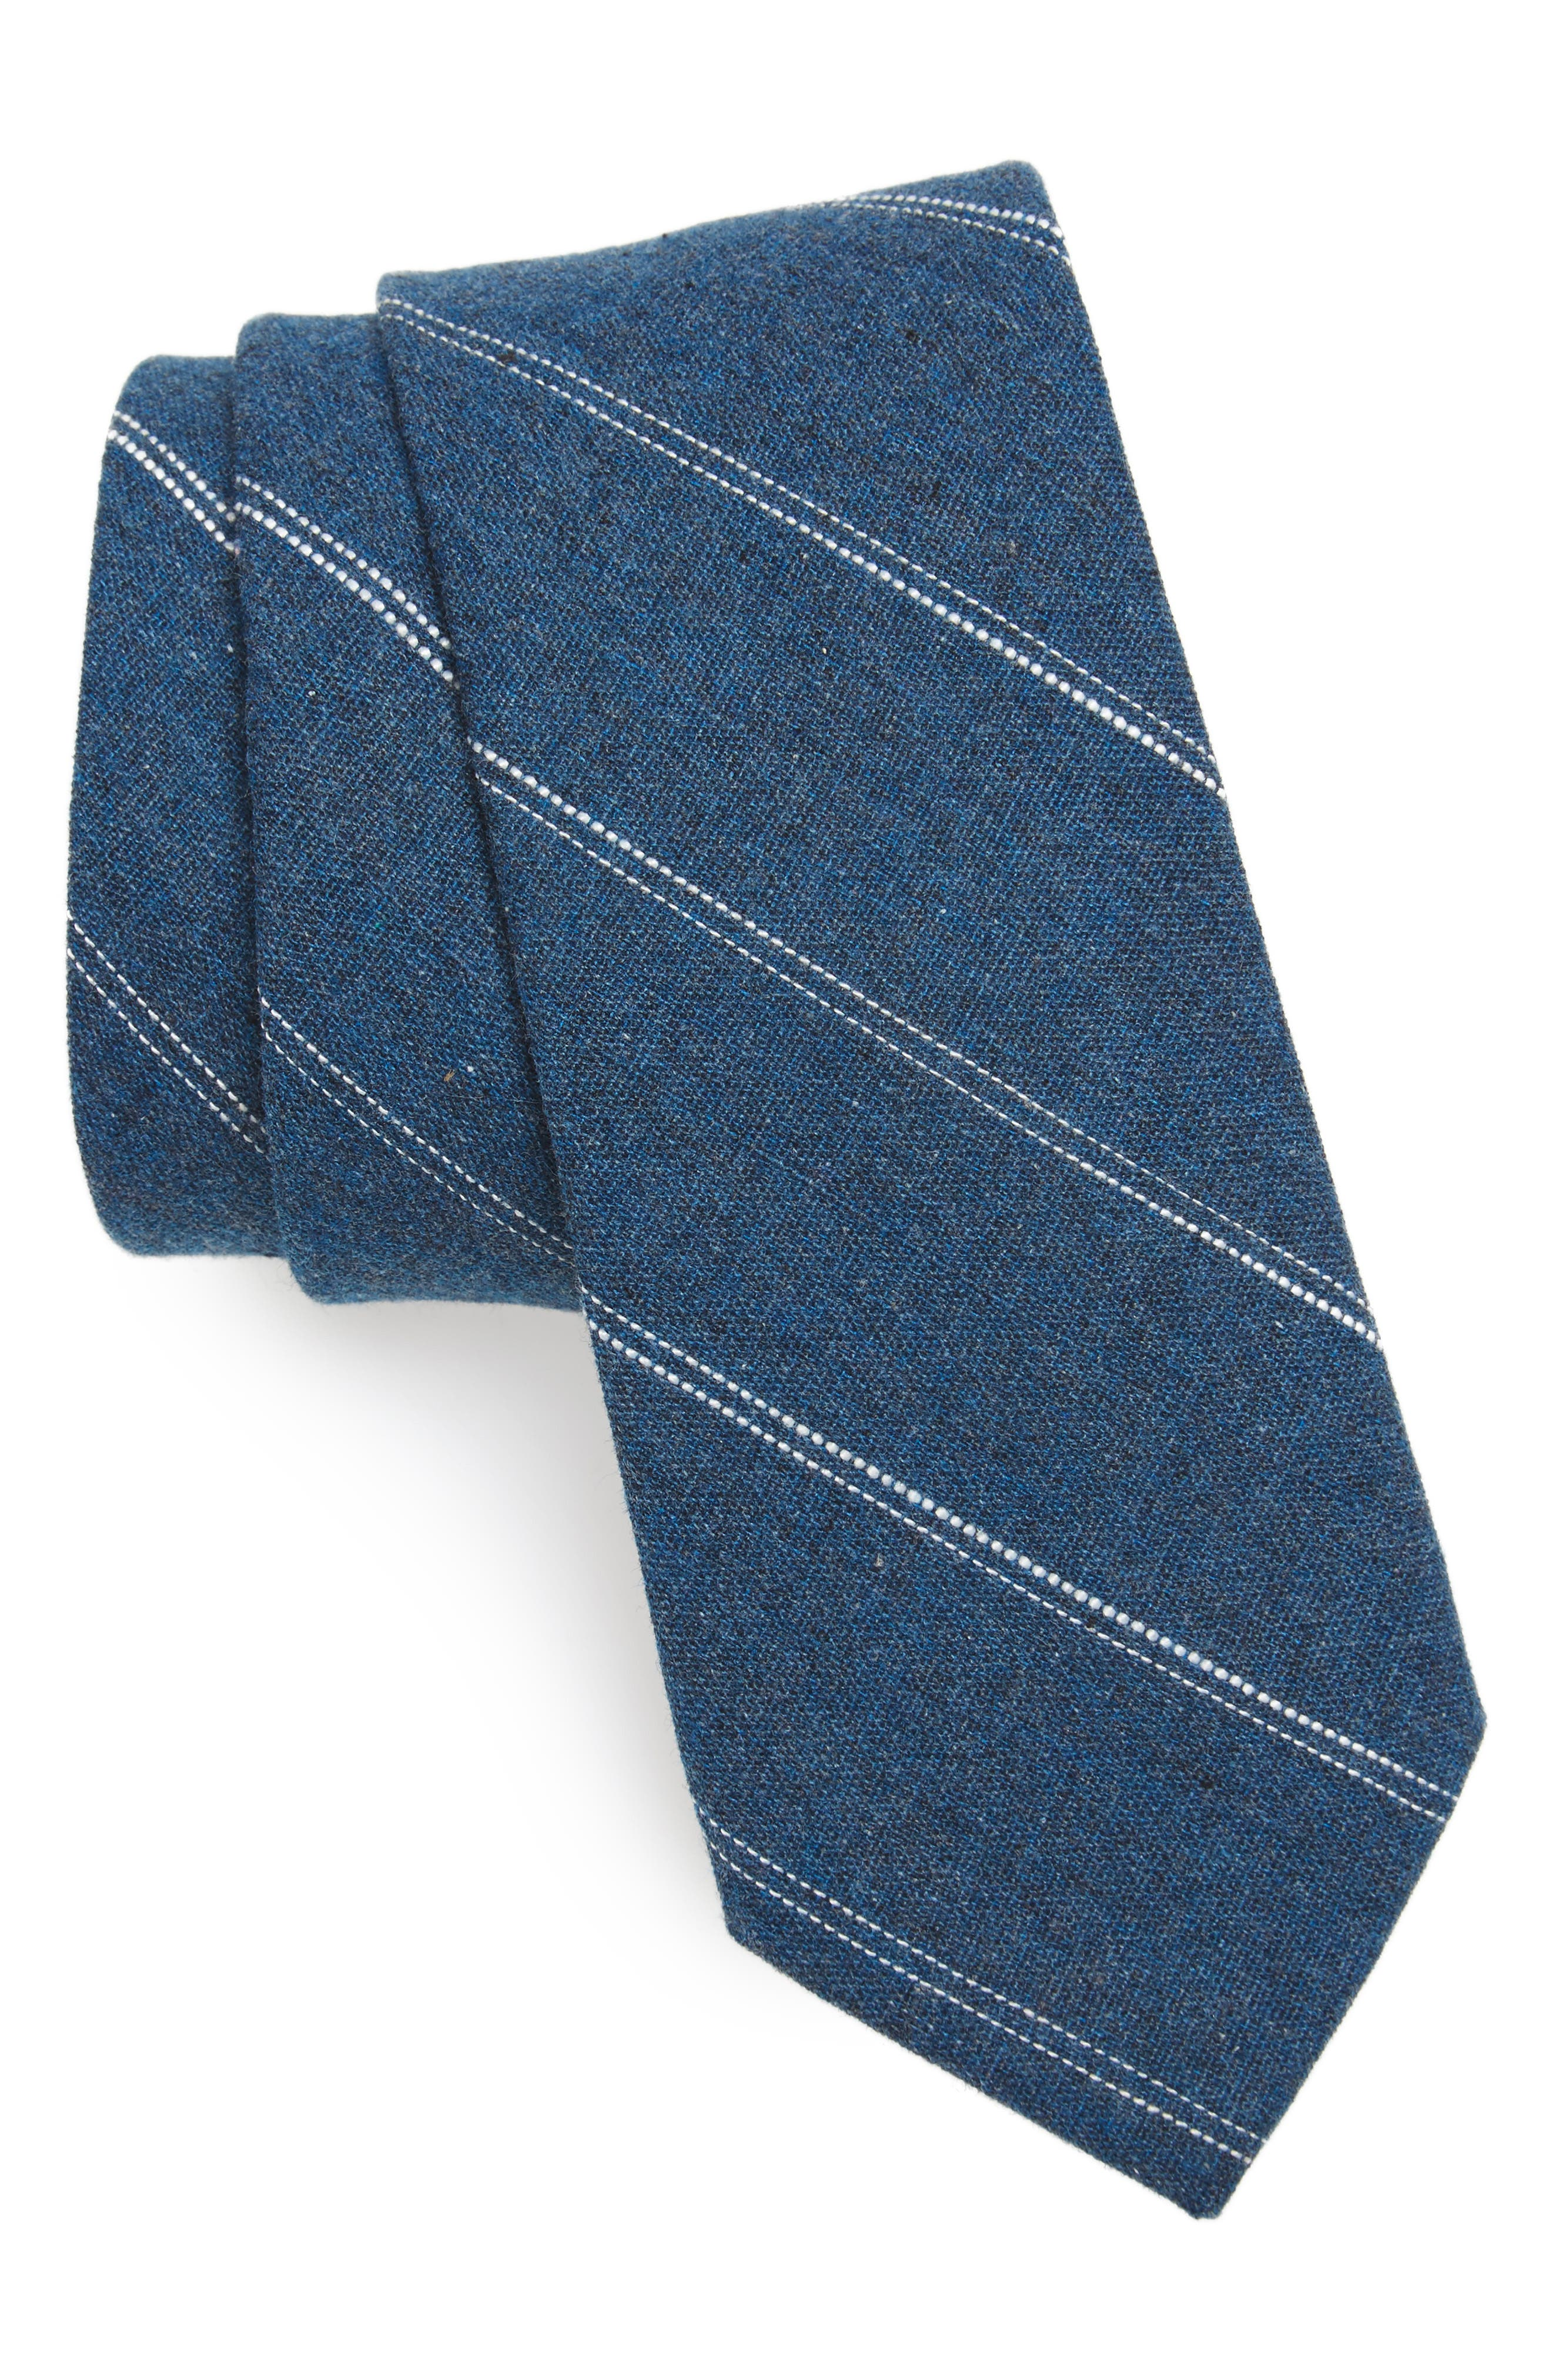 Alternate Image 1 Selected - Nordstrom Men's Shop Palamino Stripe Cotton & Linen Skinny Tie